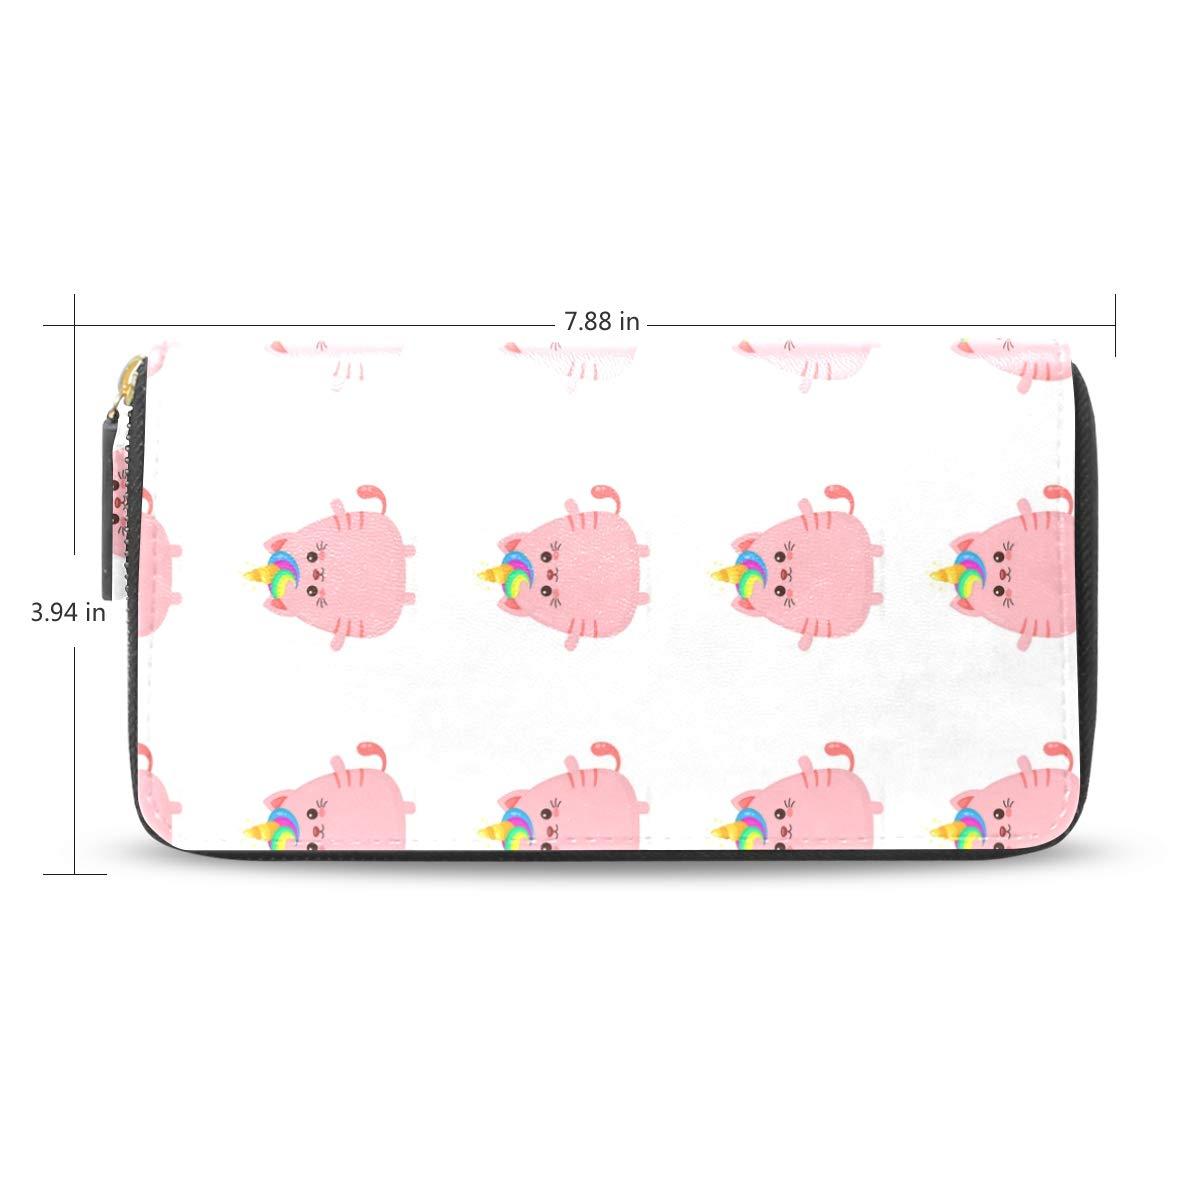 Women Unicorn Cat Leather Wallet Large Capacity Zipper Travel Wristlet Bags Clutch Cellphone Bag